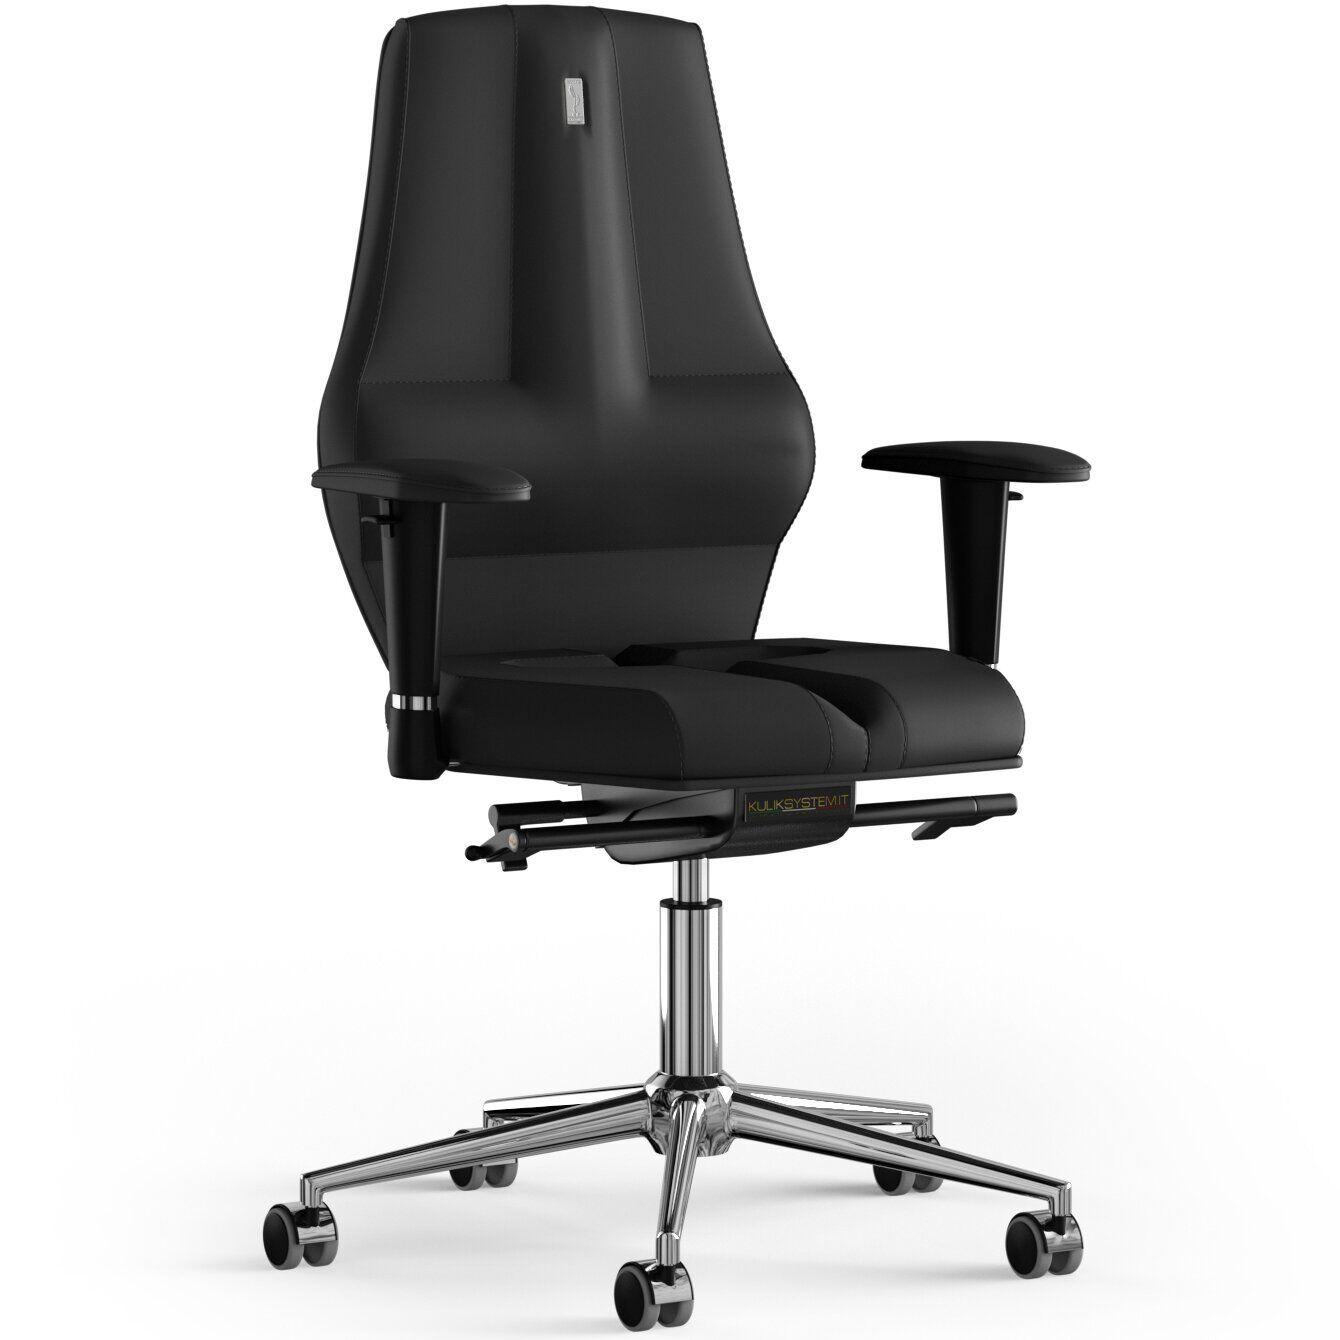 Кресло KULIK SYSTEM NANO Экокожа без подголовника без строчки